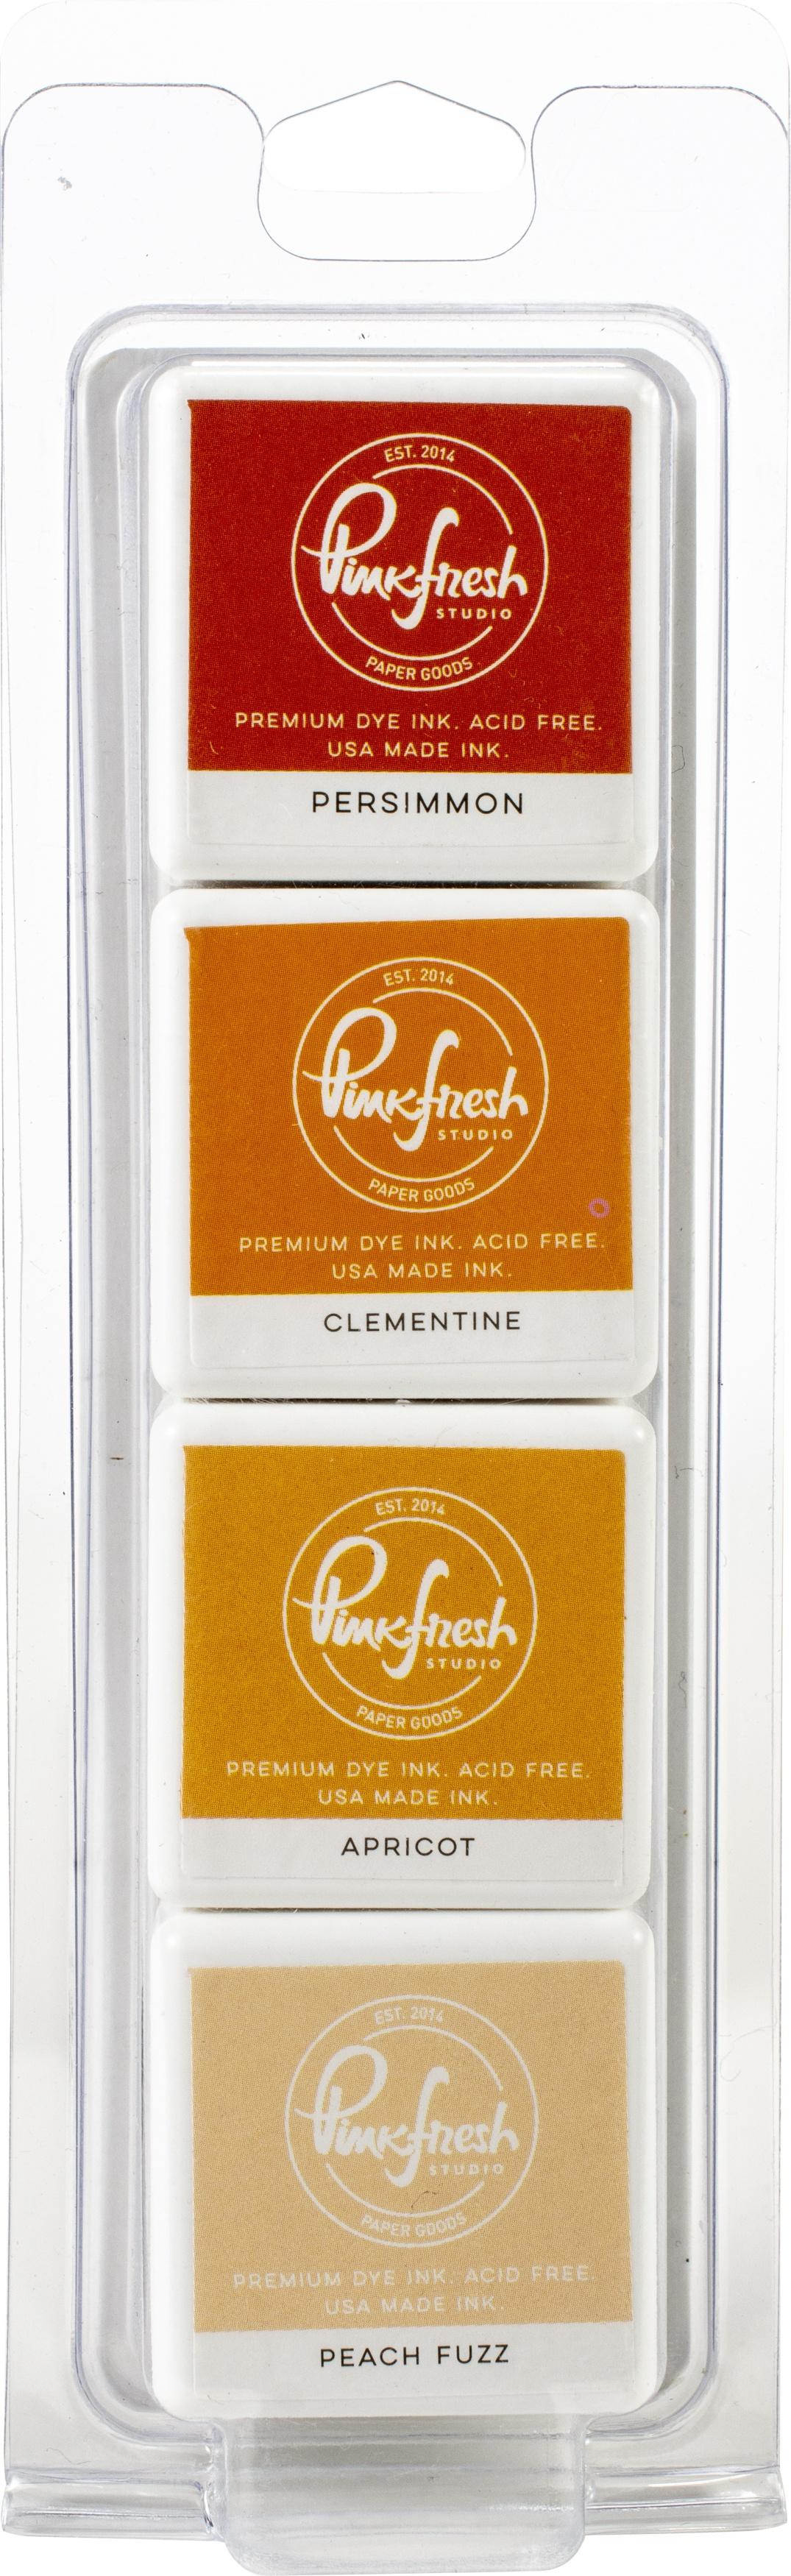 Pinkfresh Studio Premium Dye Cube Ink Pads 4 Colors-Indian Summer